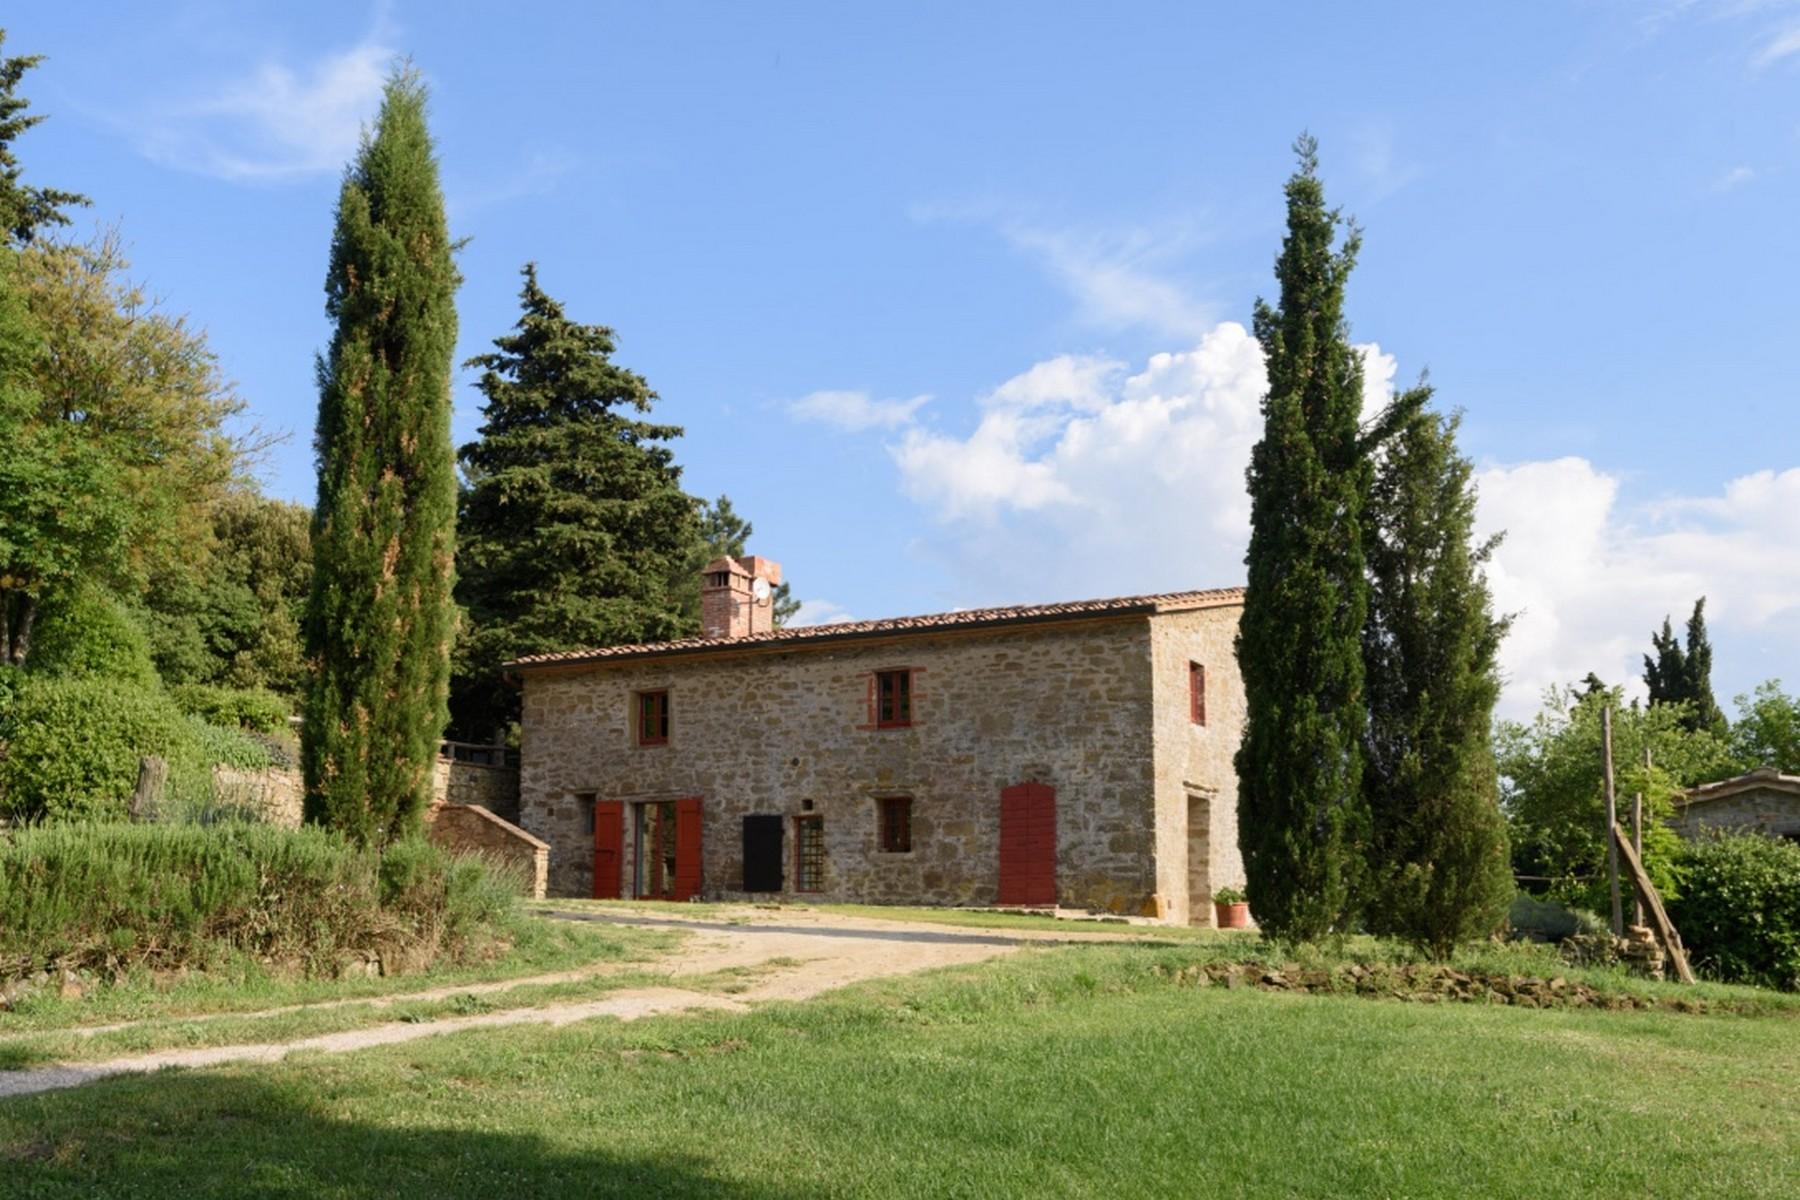 Additional photo for property listing at Siena view - Country retreat Chianti hills Monte San Savino, Arezzo Italie